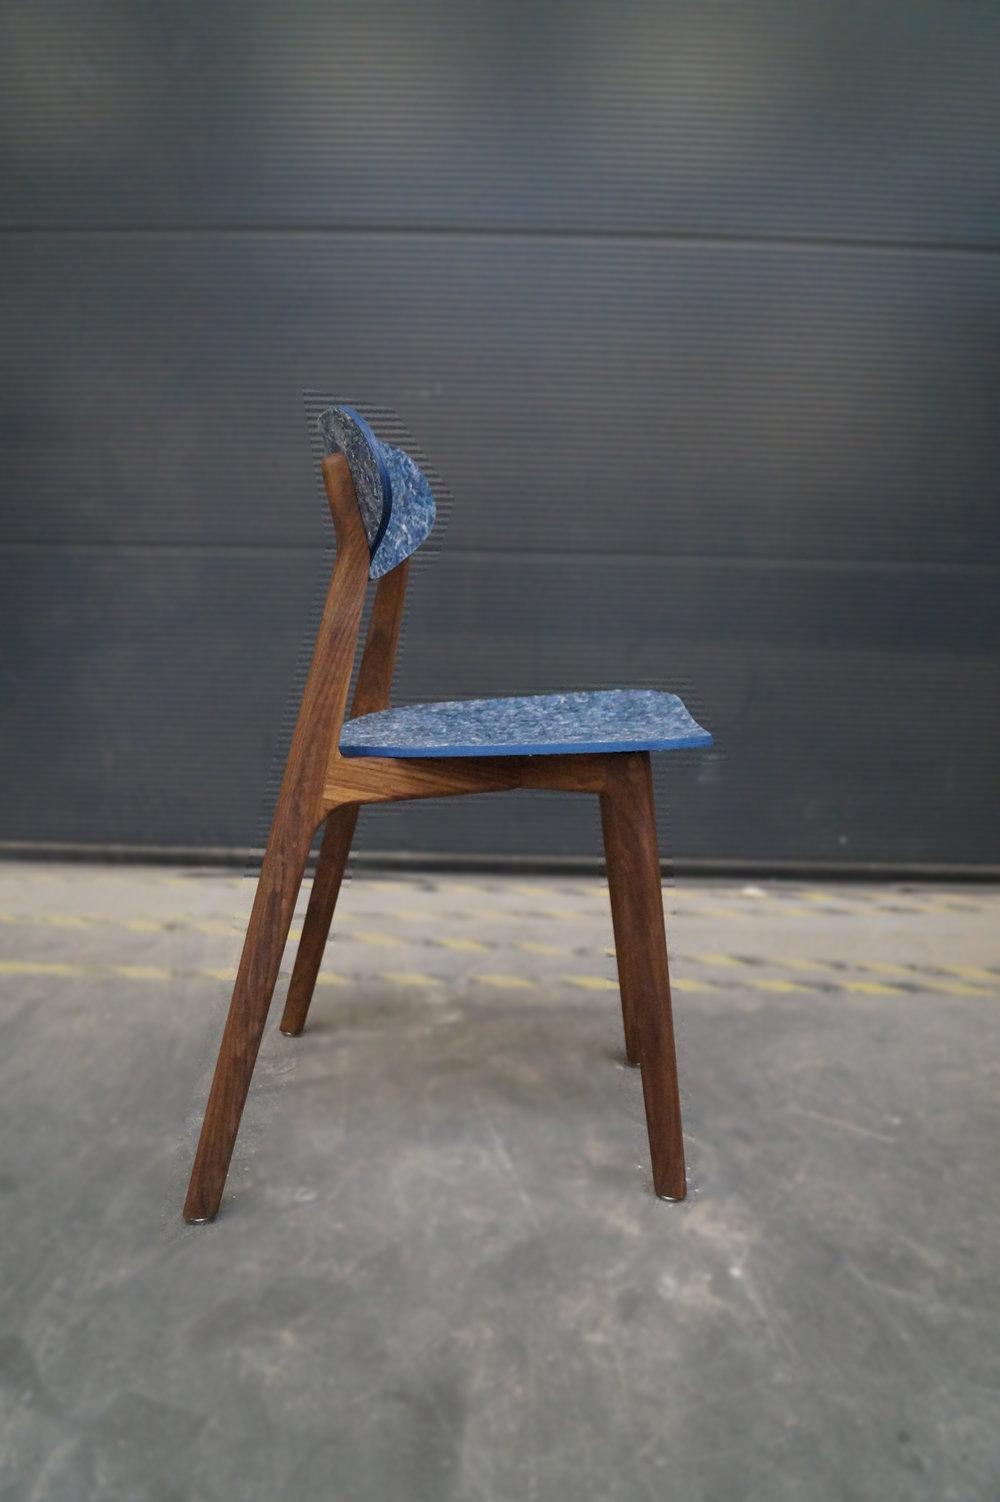 products love ubu furniture. Ubu Furniture. Ubu_chair_right_01.jpg Furniture Products Love